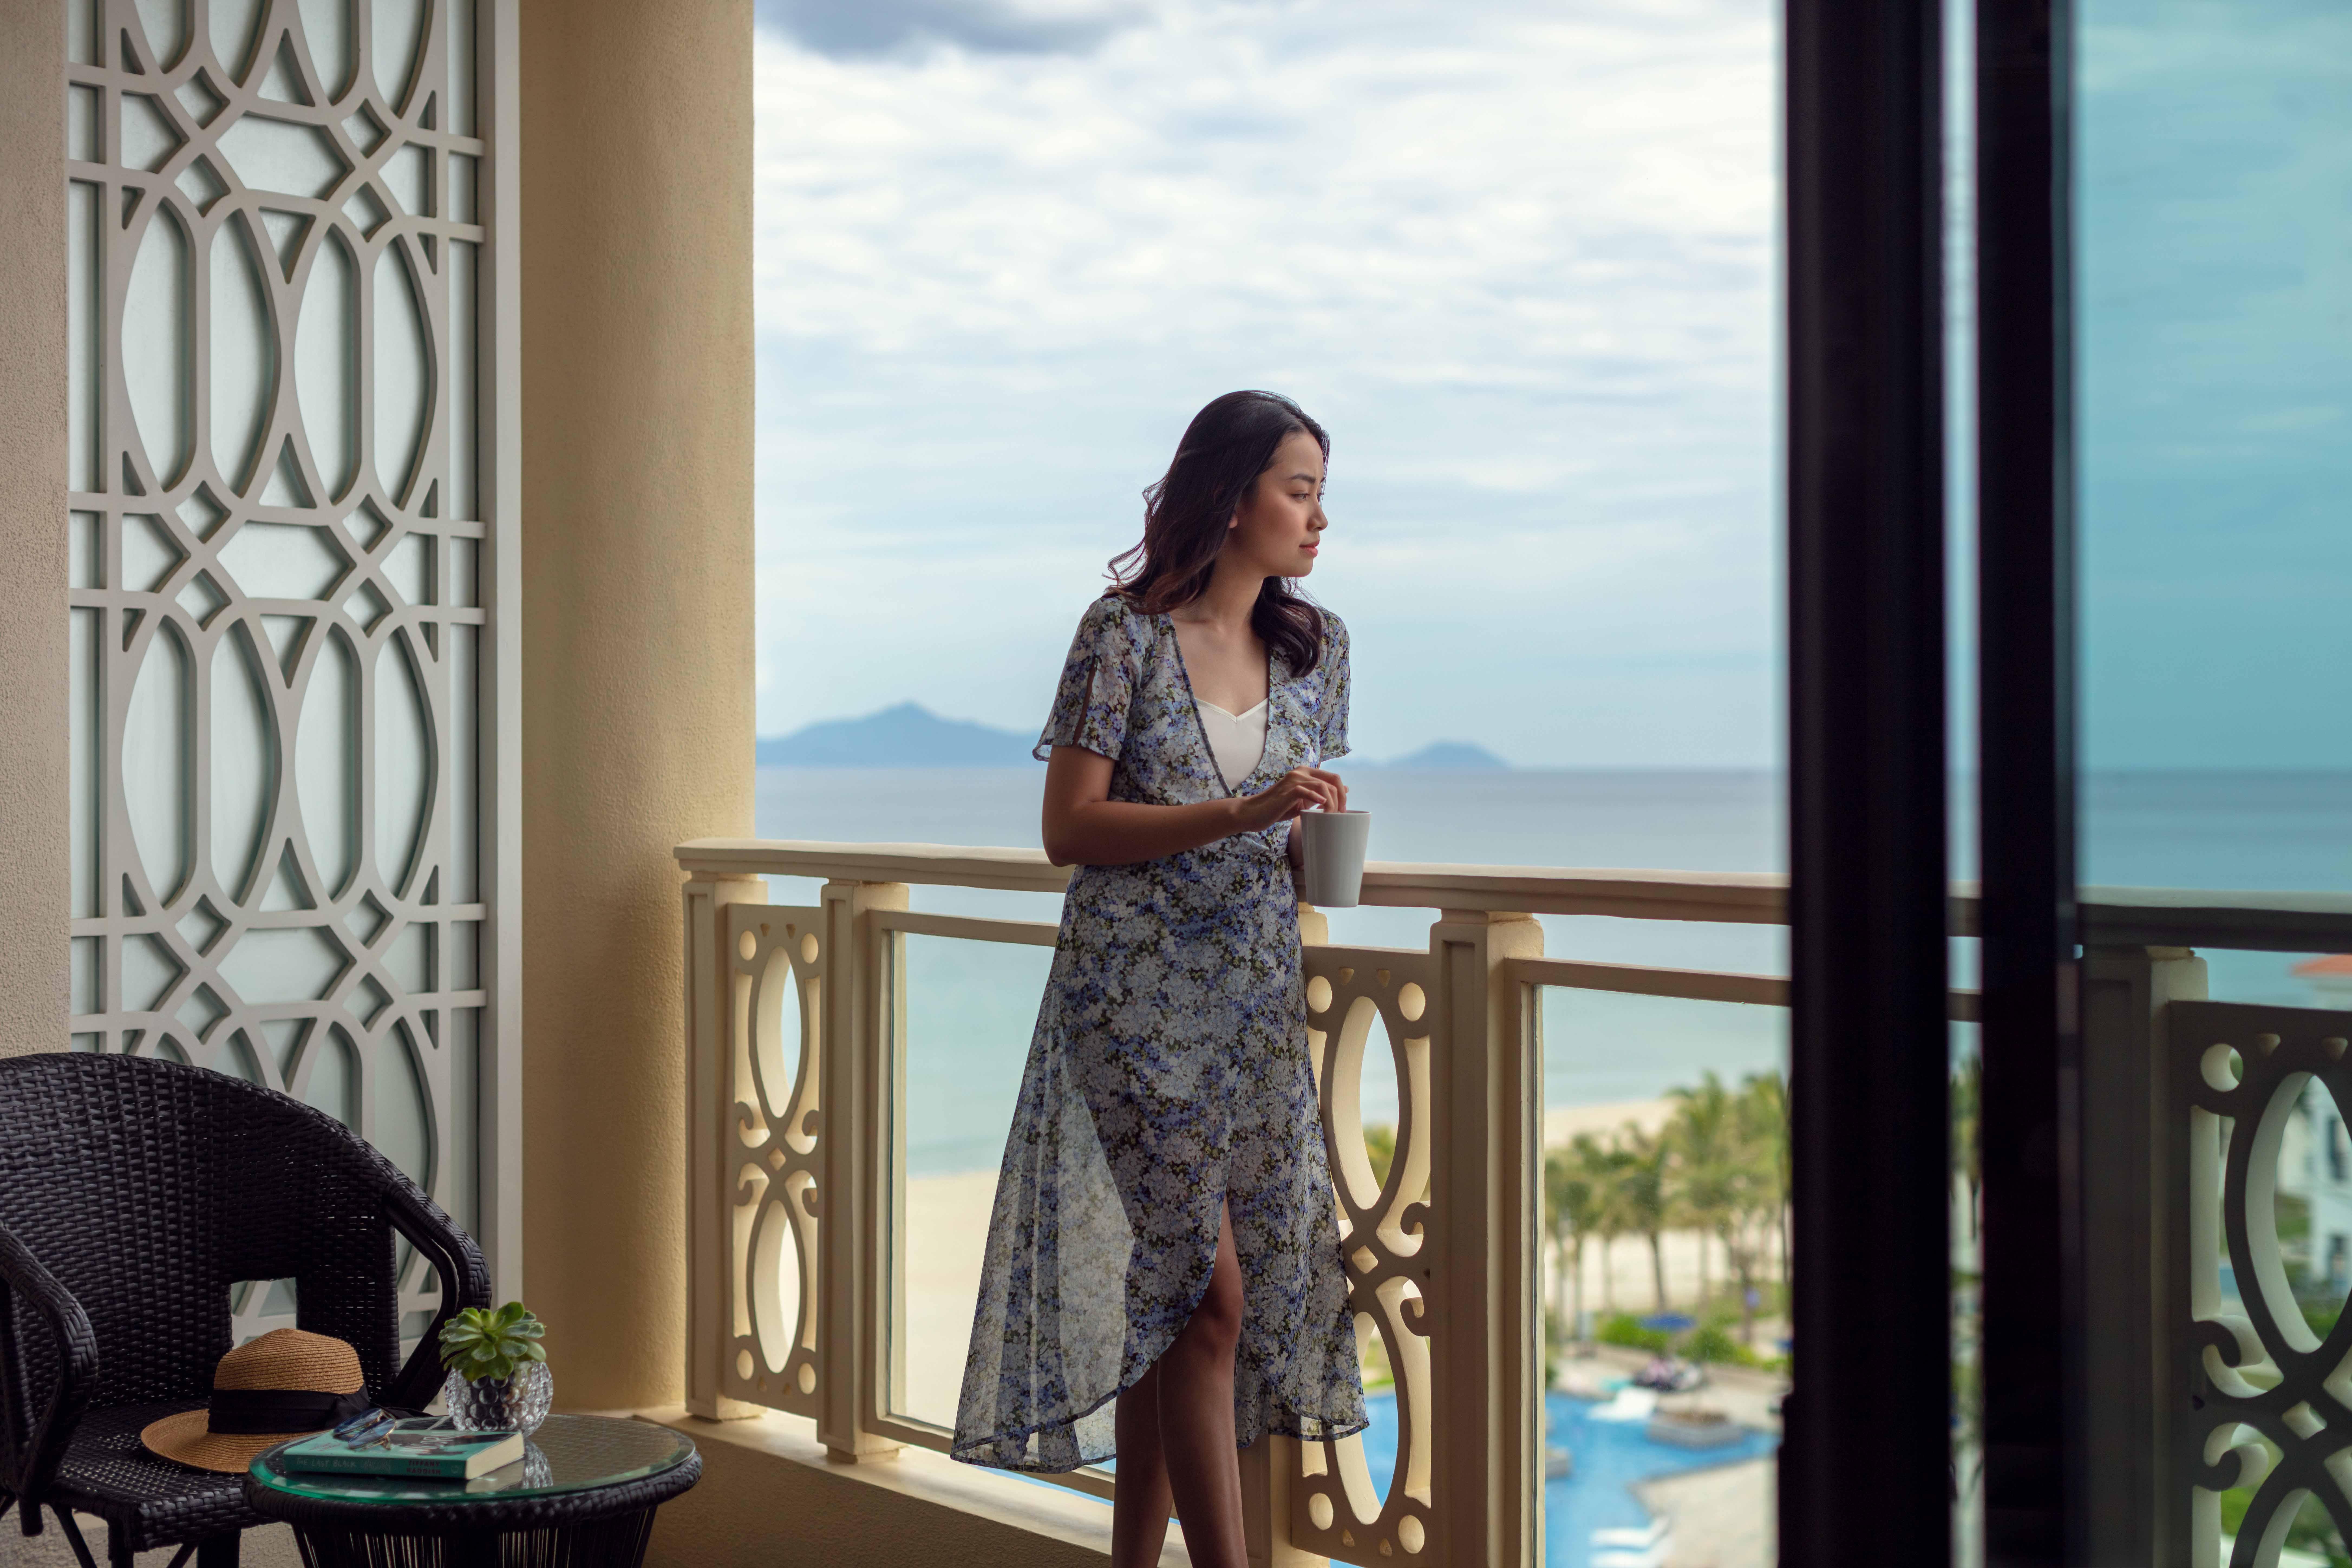 SGDN Lifestyle Balcony